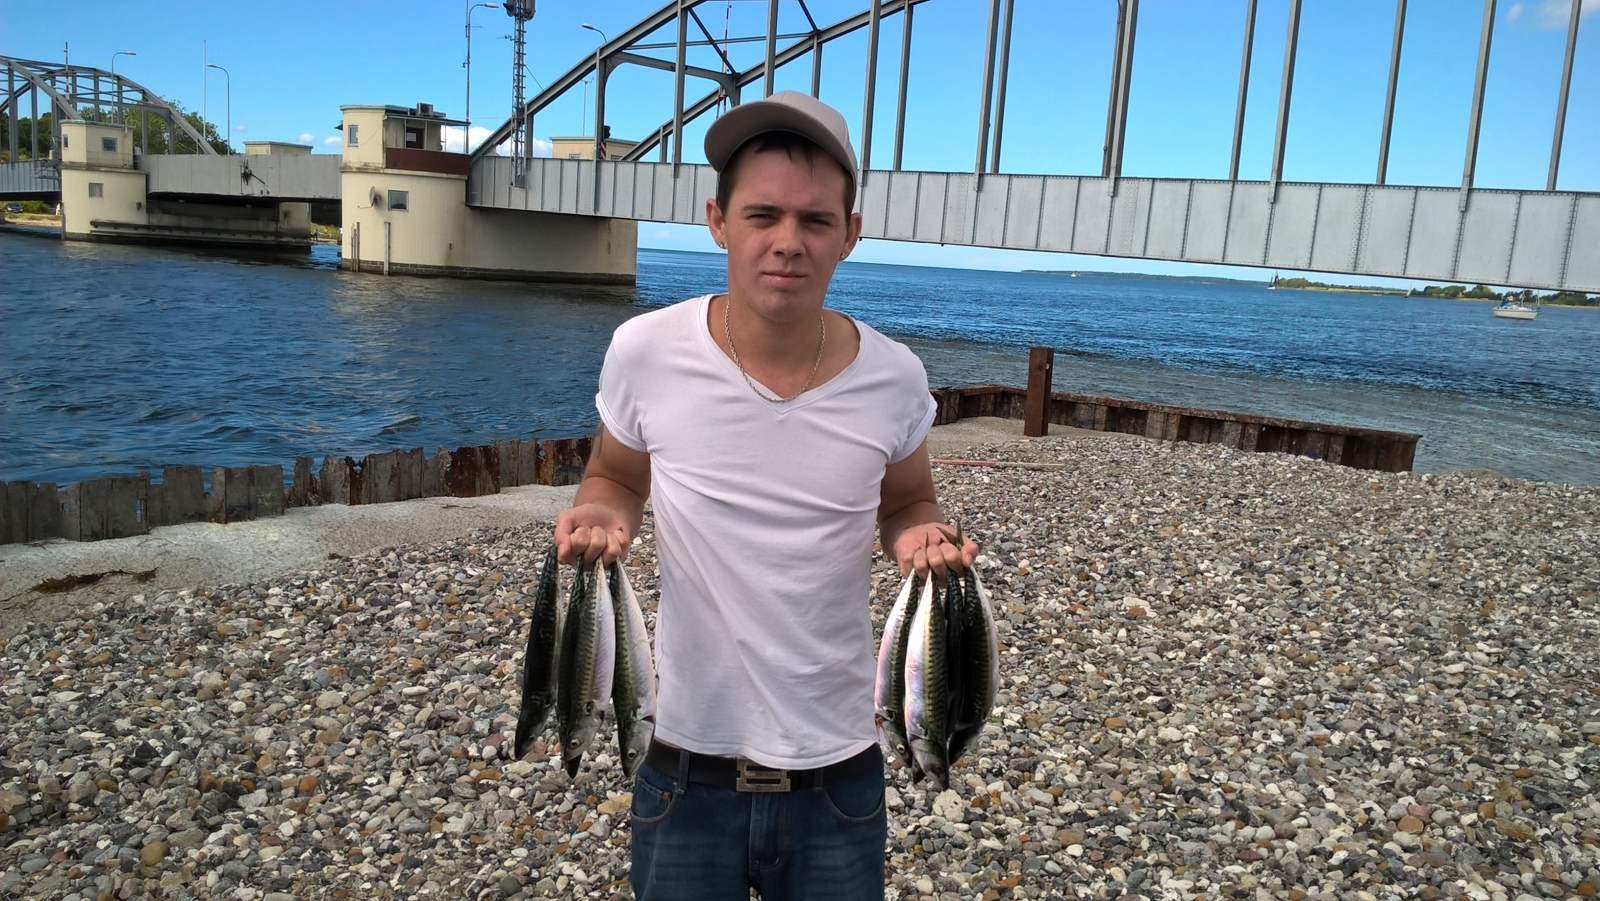 Makrel fra Guldborg, Lolland-Falster -  fanget på Sildeforfang # 6098